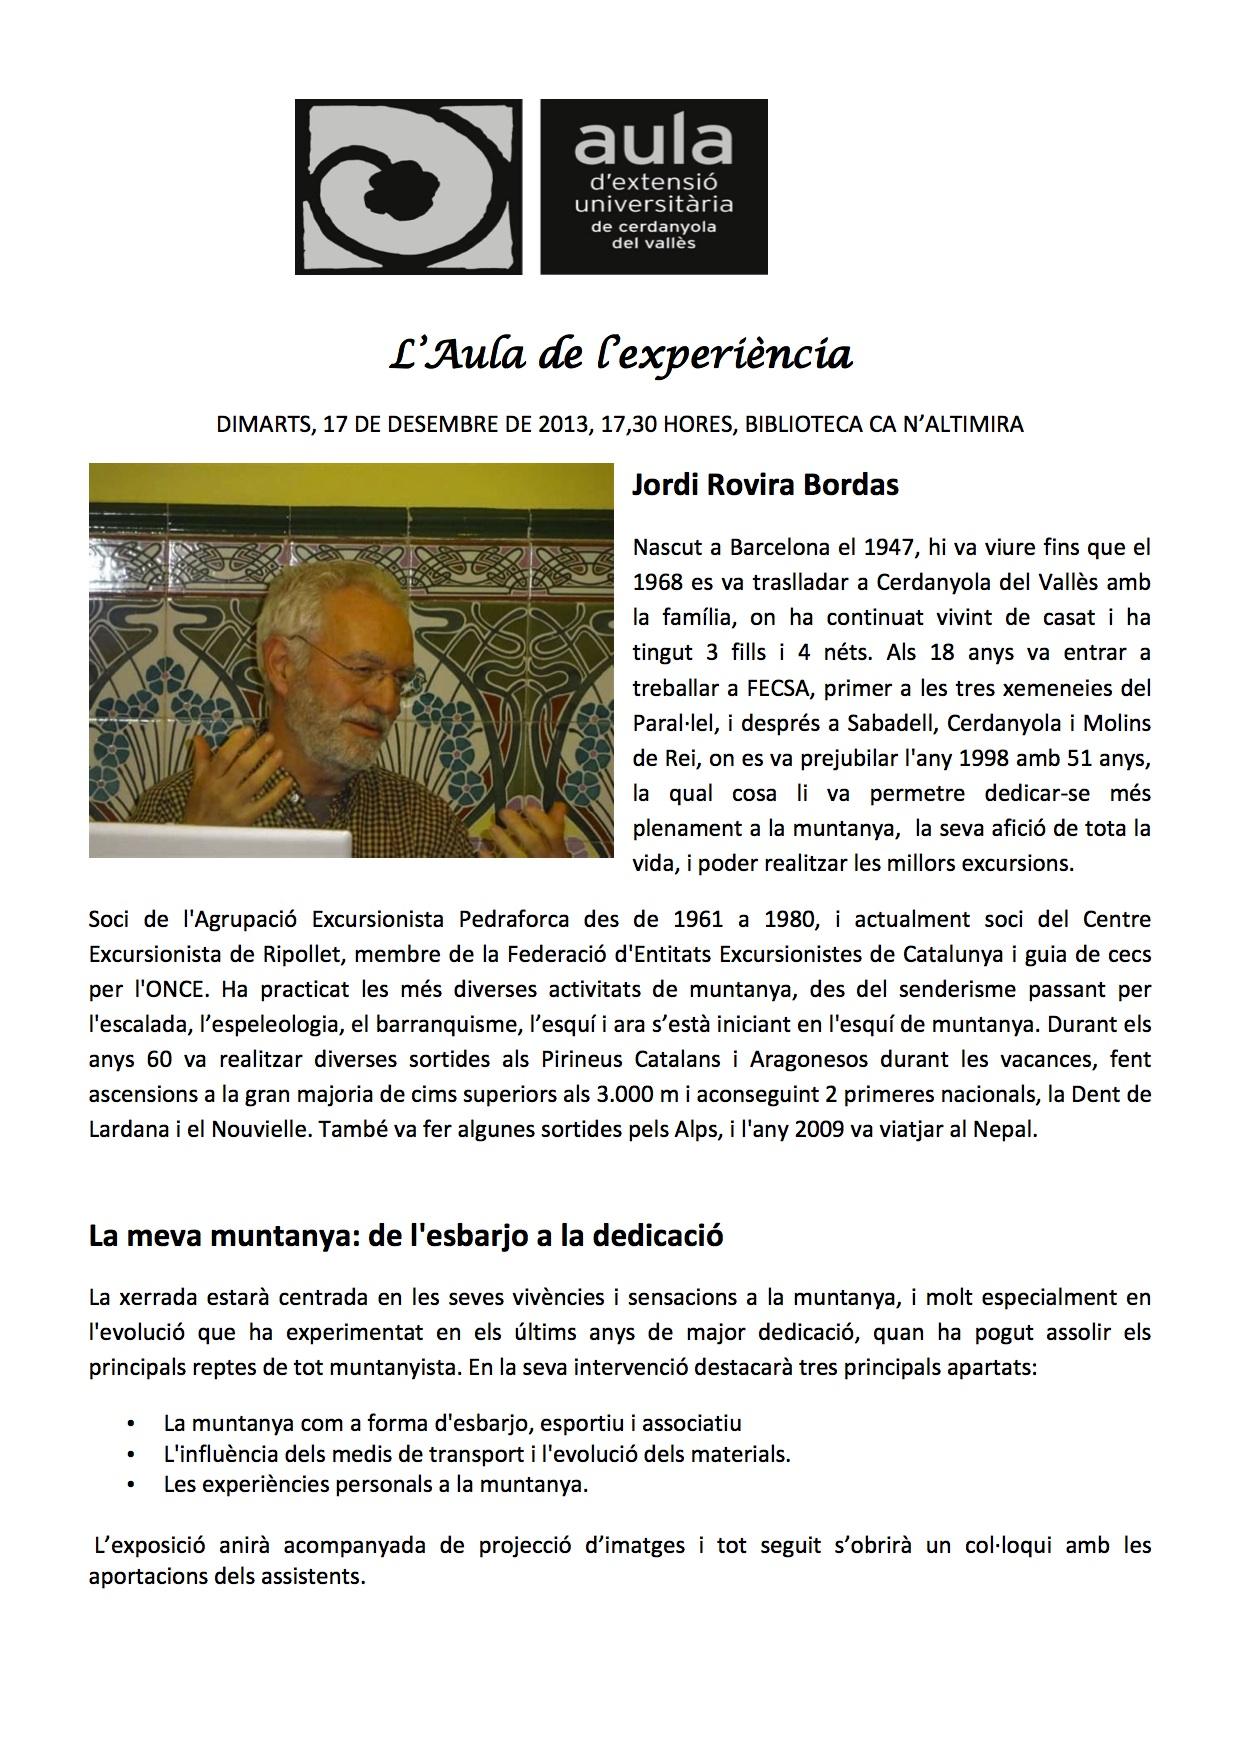 Aula Experiència-Full-Jordi Rovira